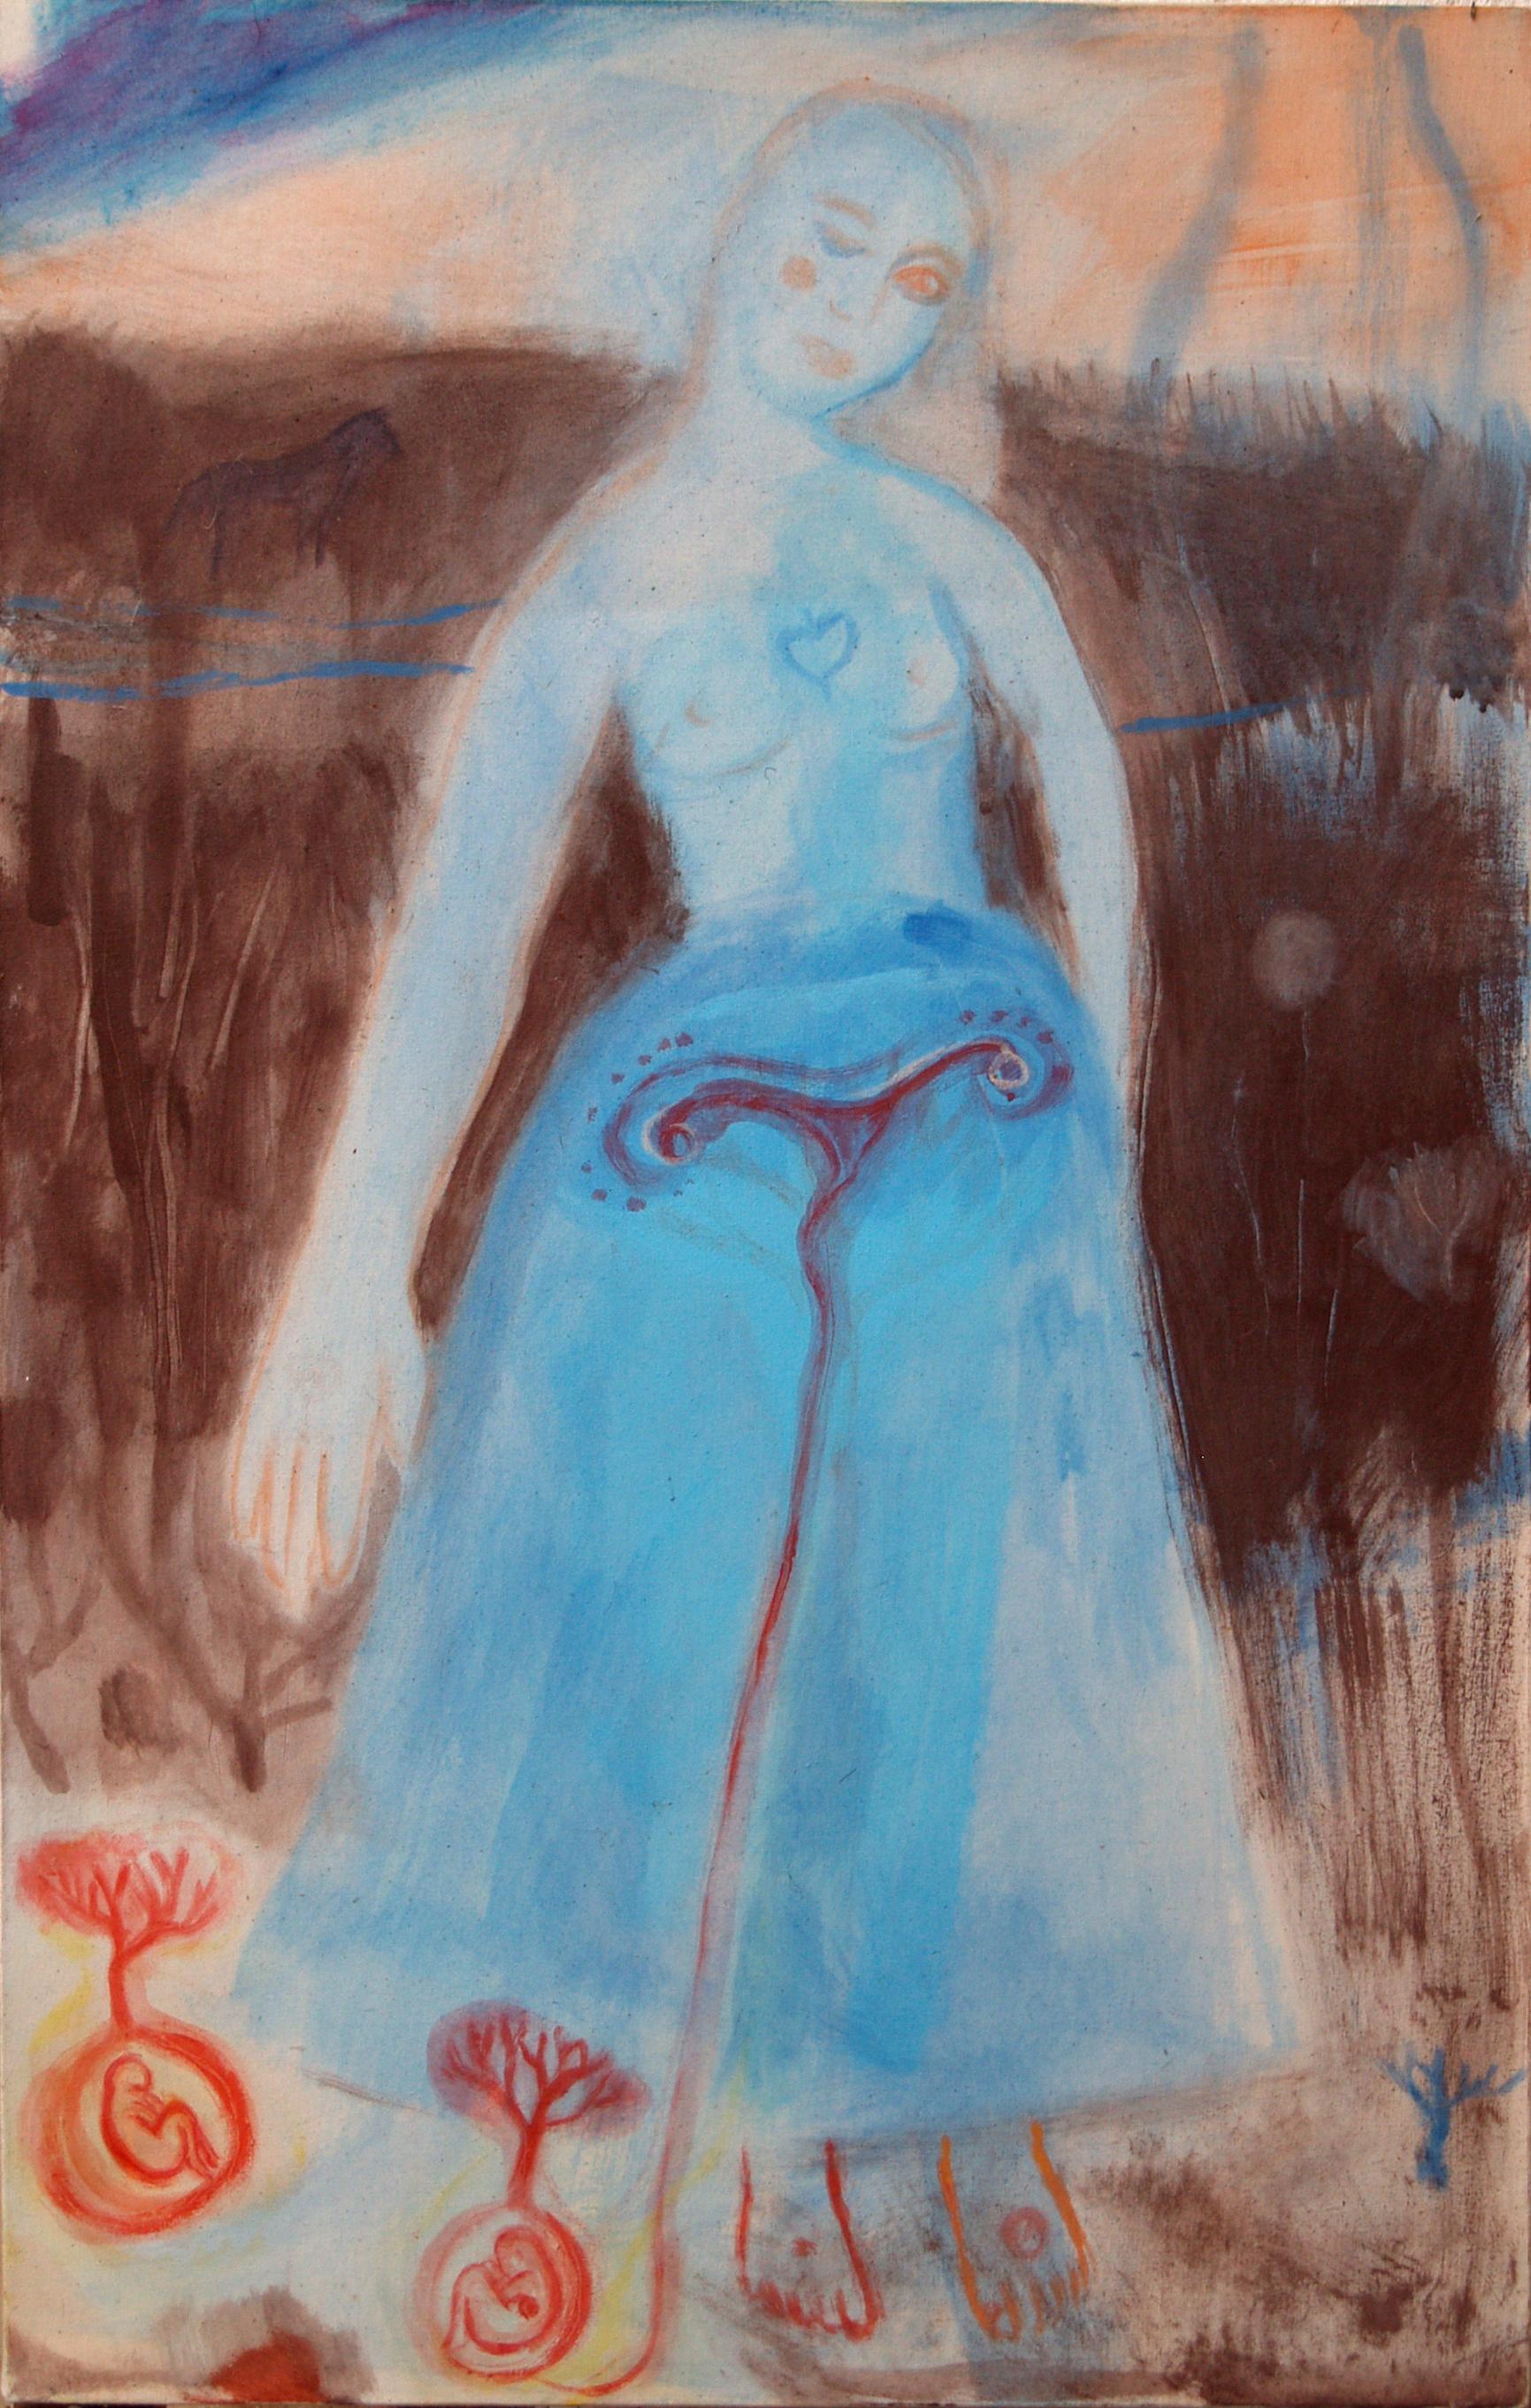 Mother - 1989 - Acrylic, Mixed Media on Canvas - 61 X 98 cm